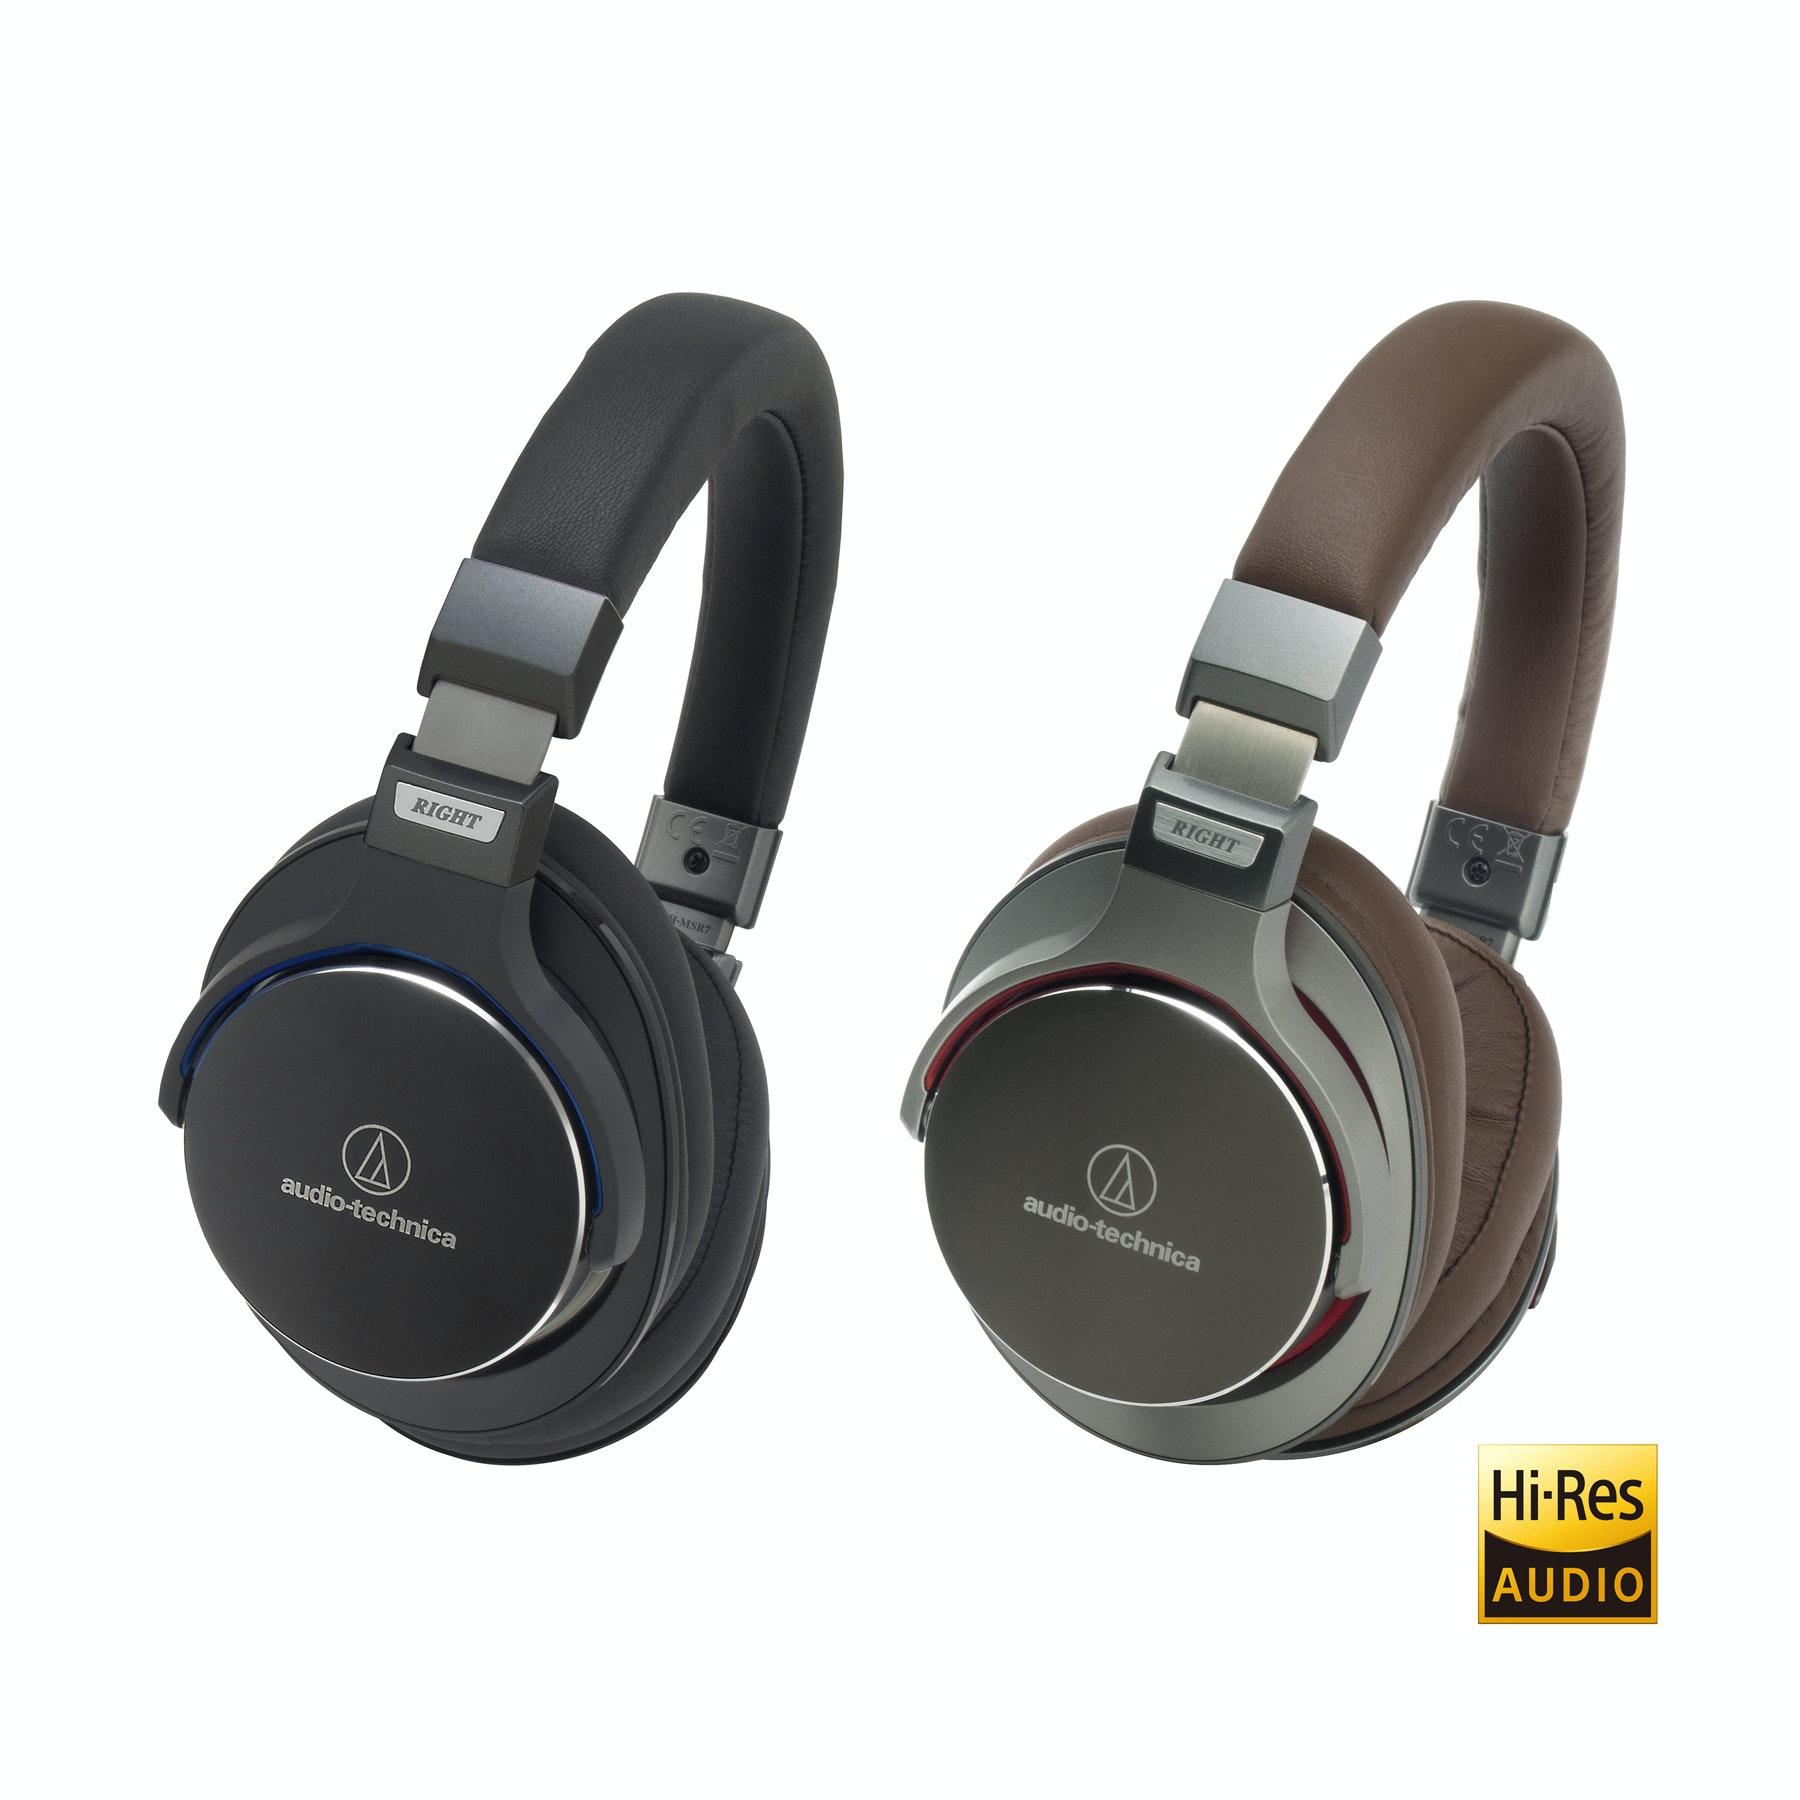 Audio-Technica ATH-MSR7 Hi-Res Audio Over-Ear Headphones